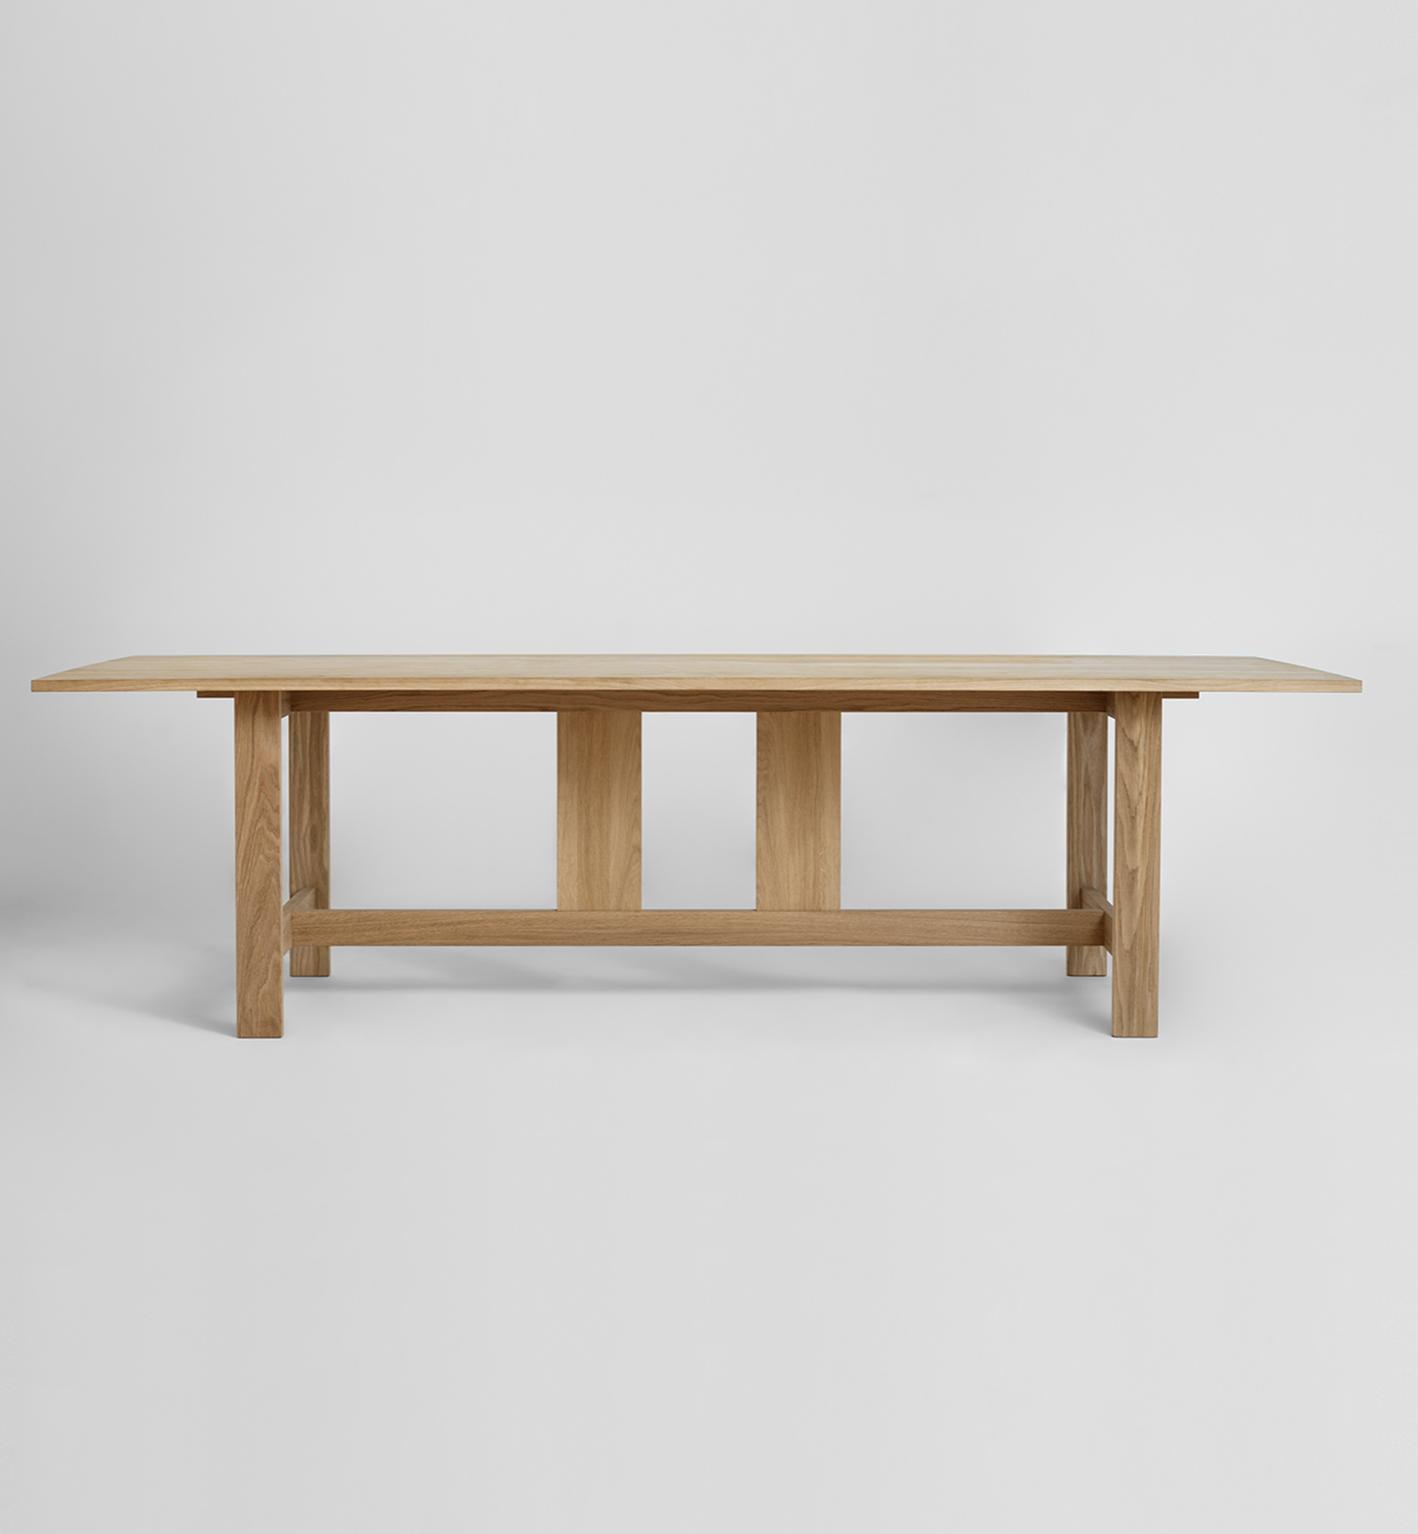 Verk / TABLE V.DE.02